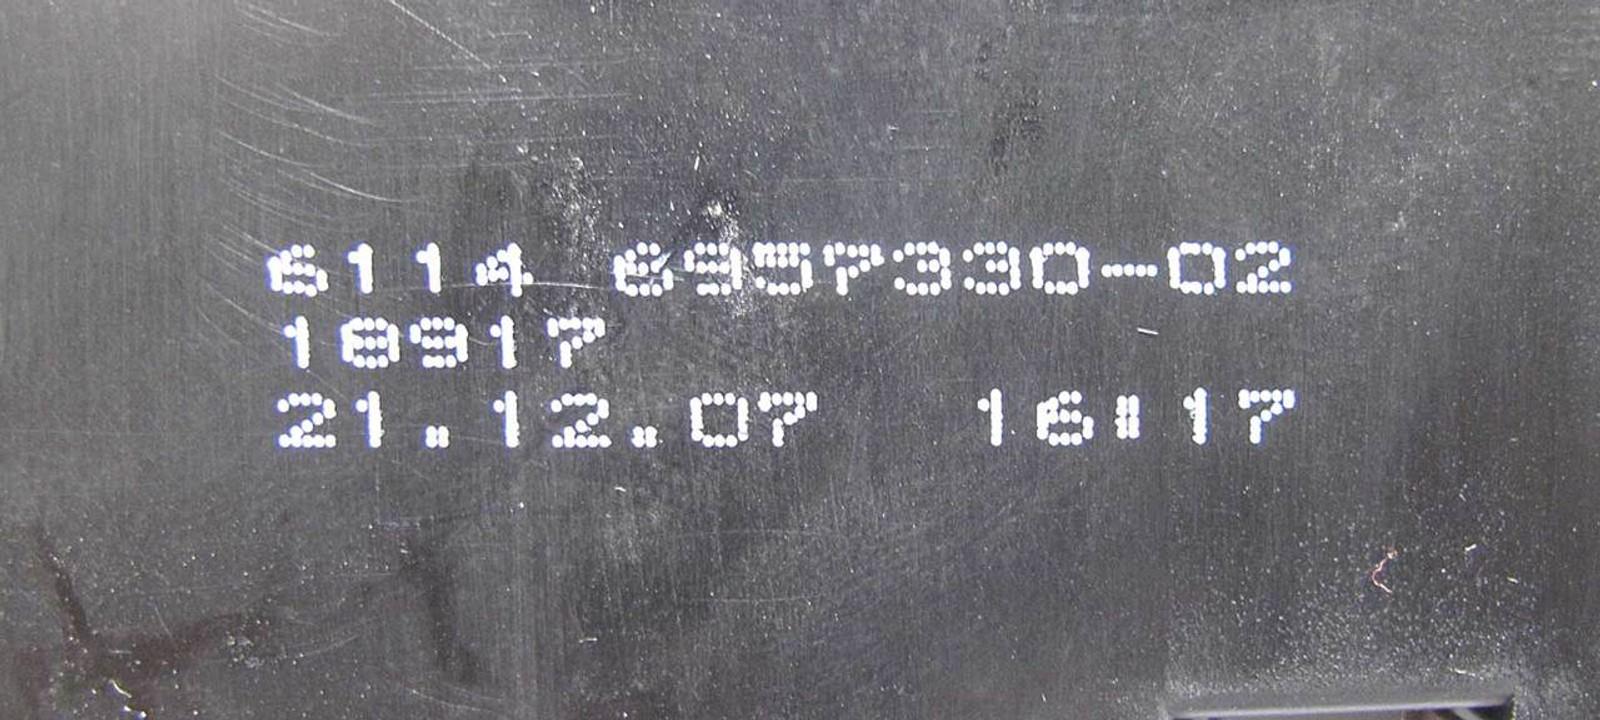 front fuse box panel 2004 img bmw  [ 1600 x 720 Pixel ]